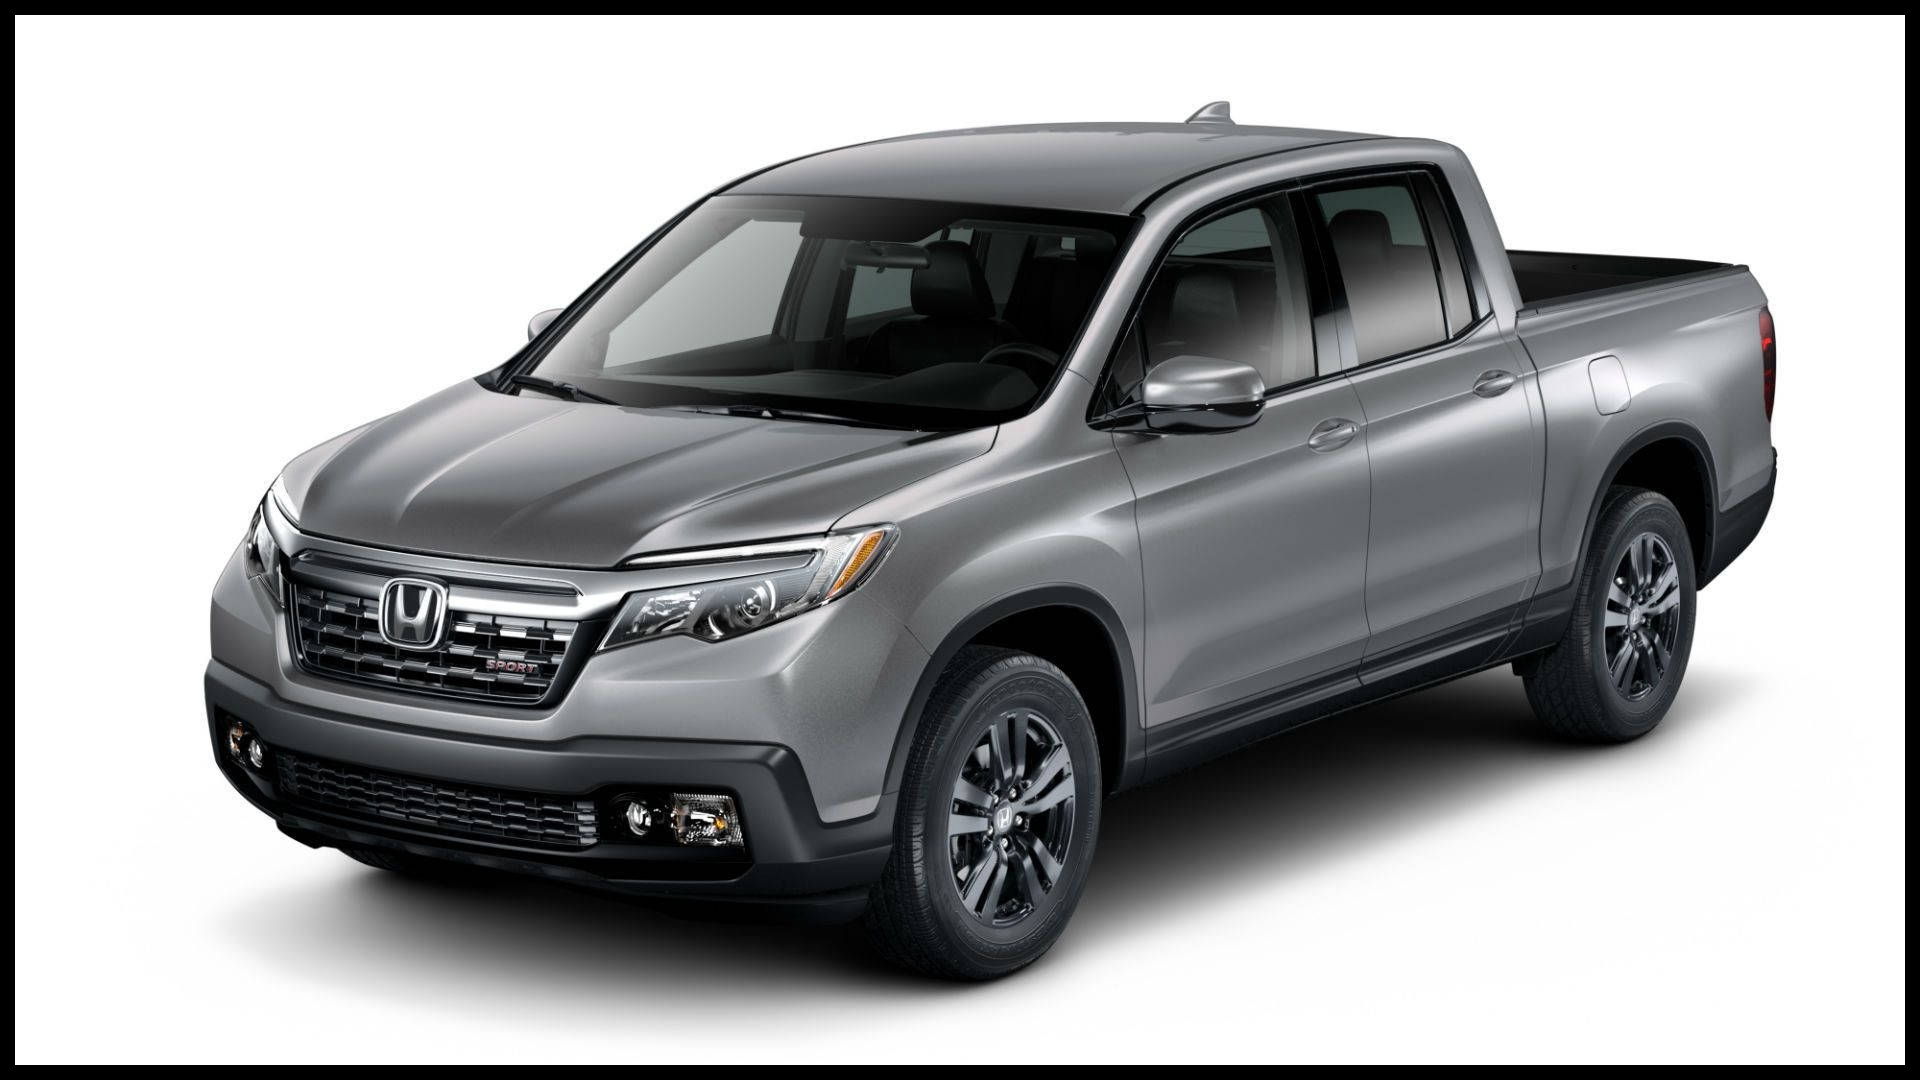 Honda Ridgeline Dealer Invoice Best 2018 Honda Ridgeline is Available now at $29 630 the